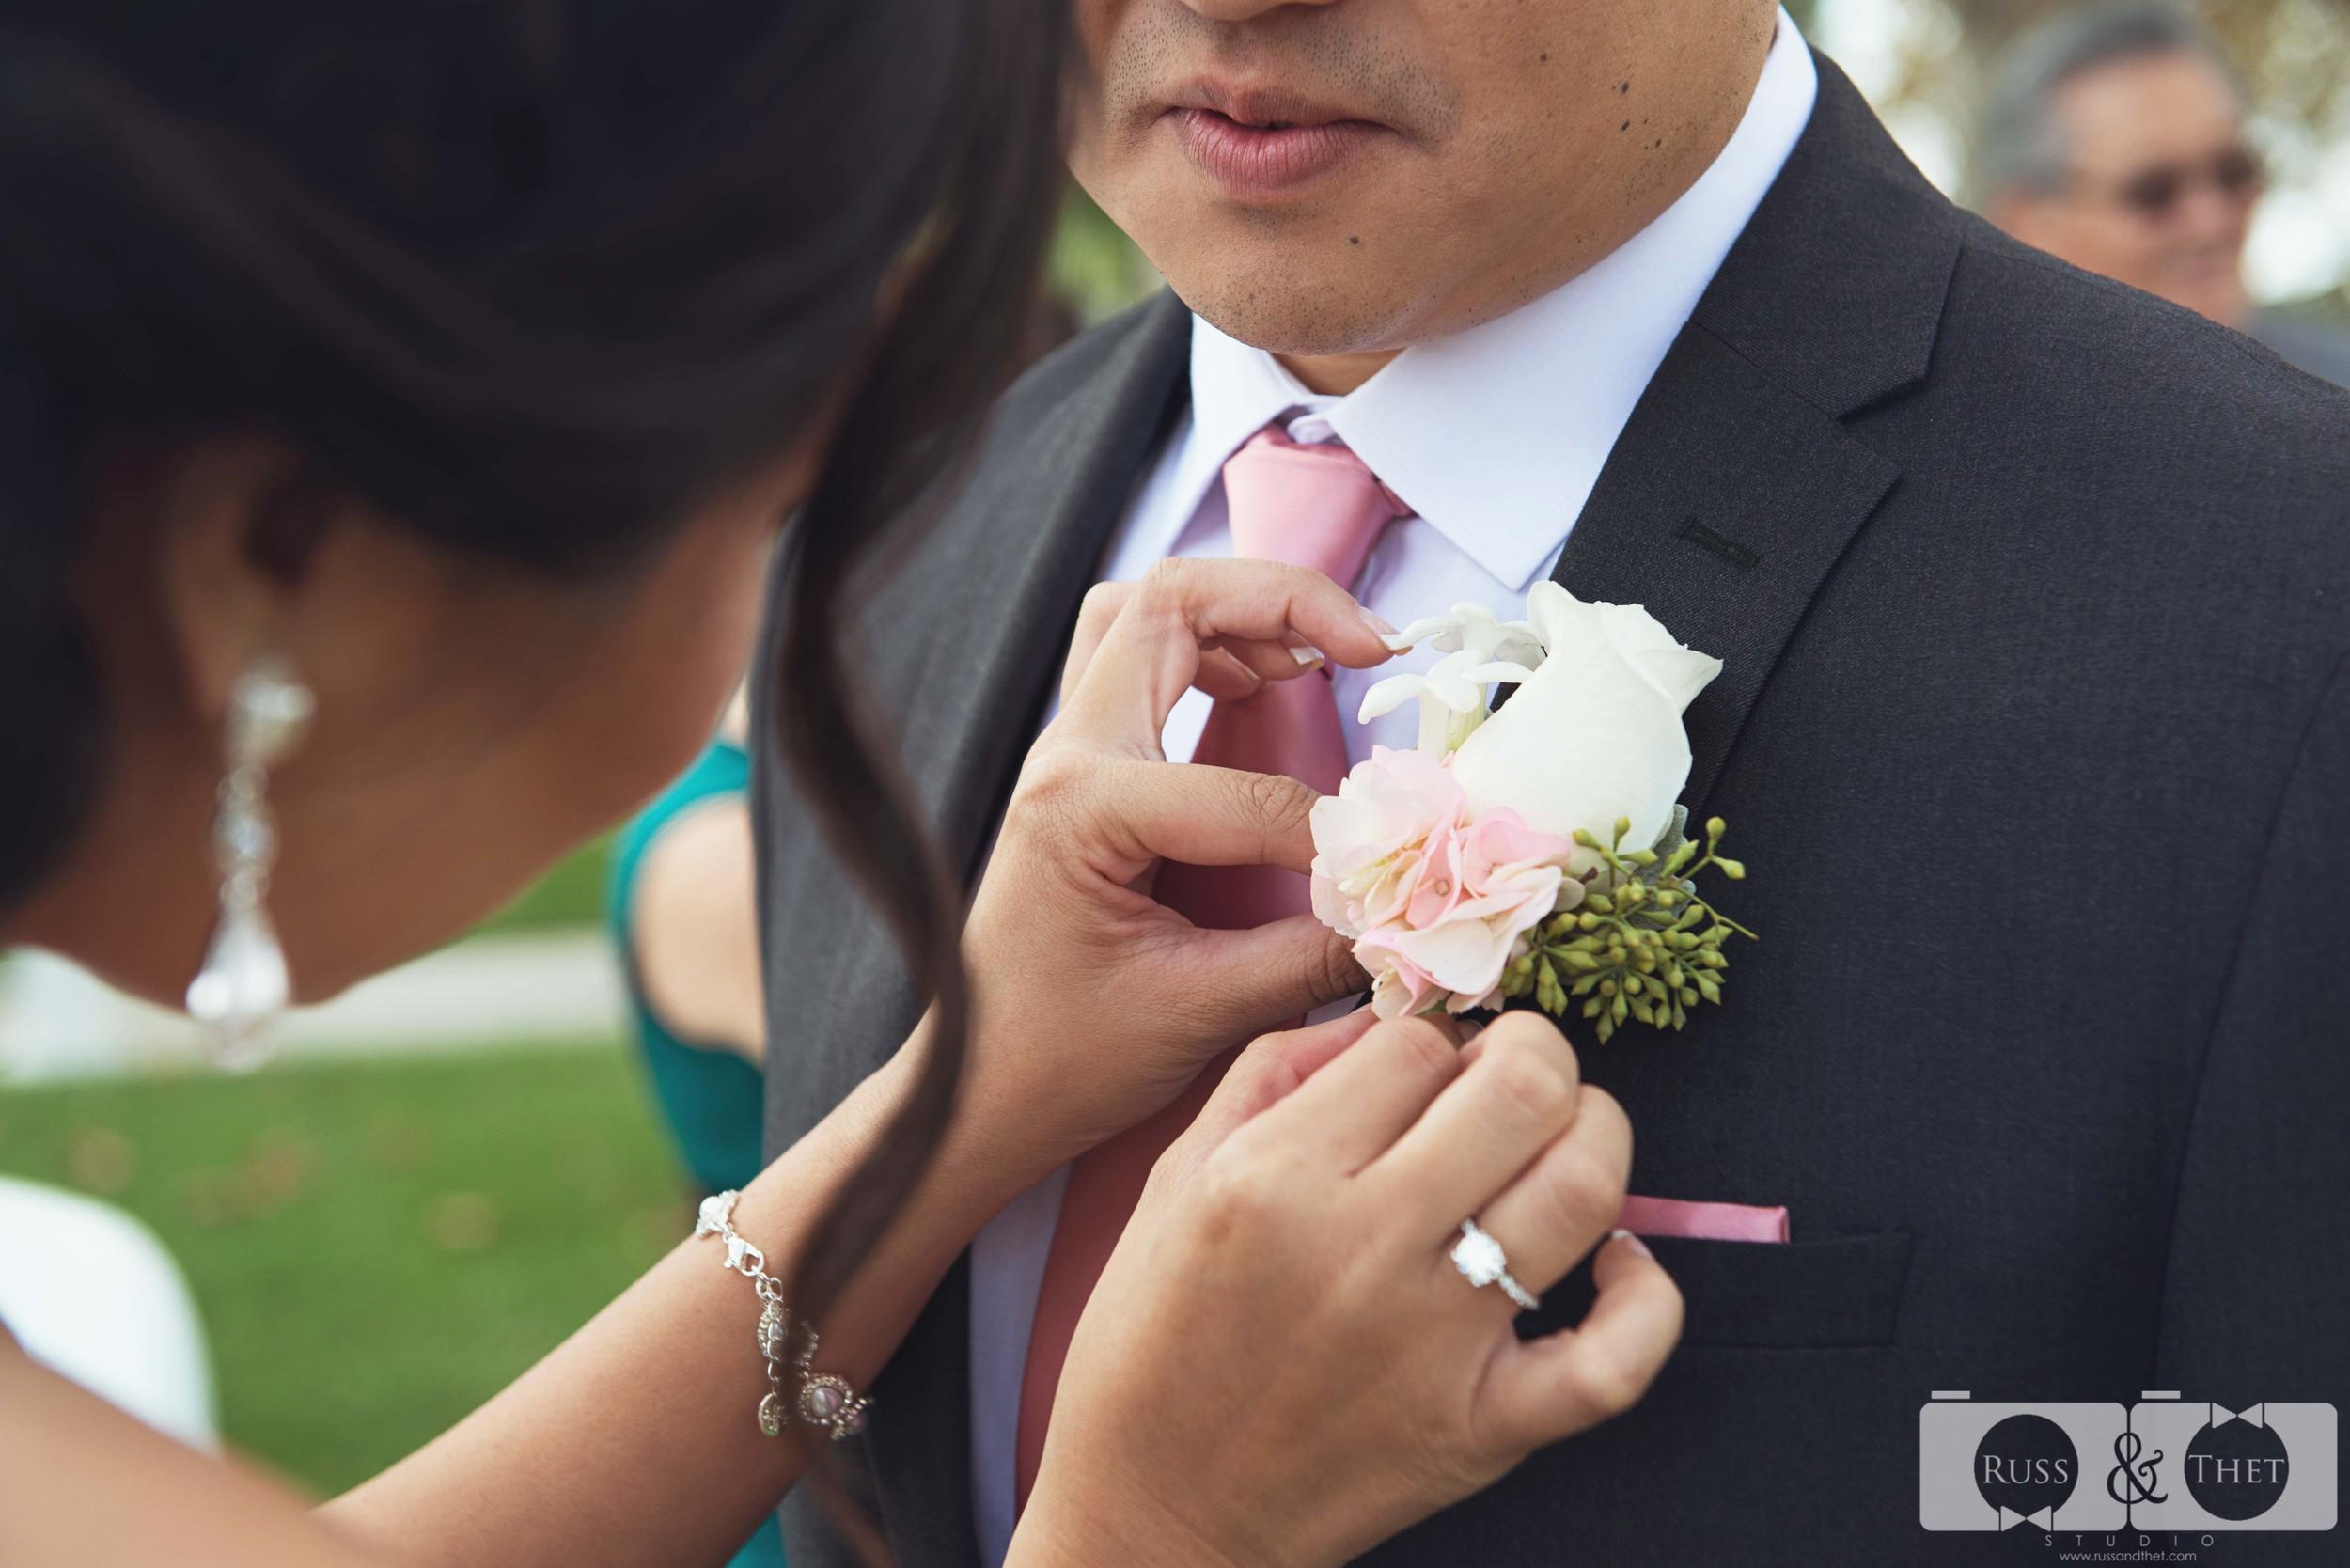 summit-house-fullerton-wedding-photographer-56.JPG